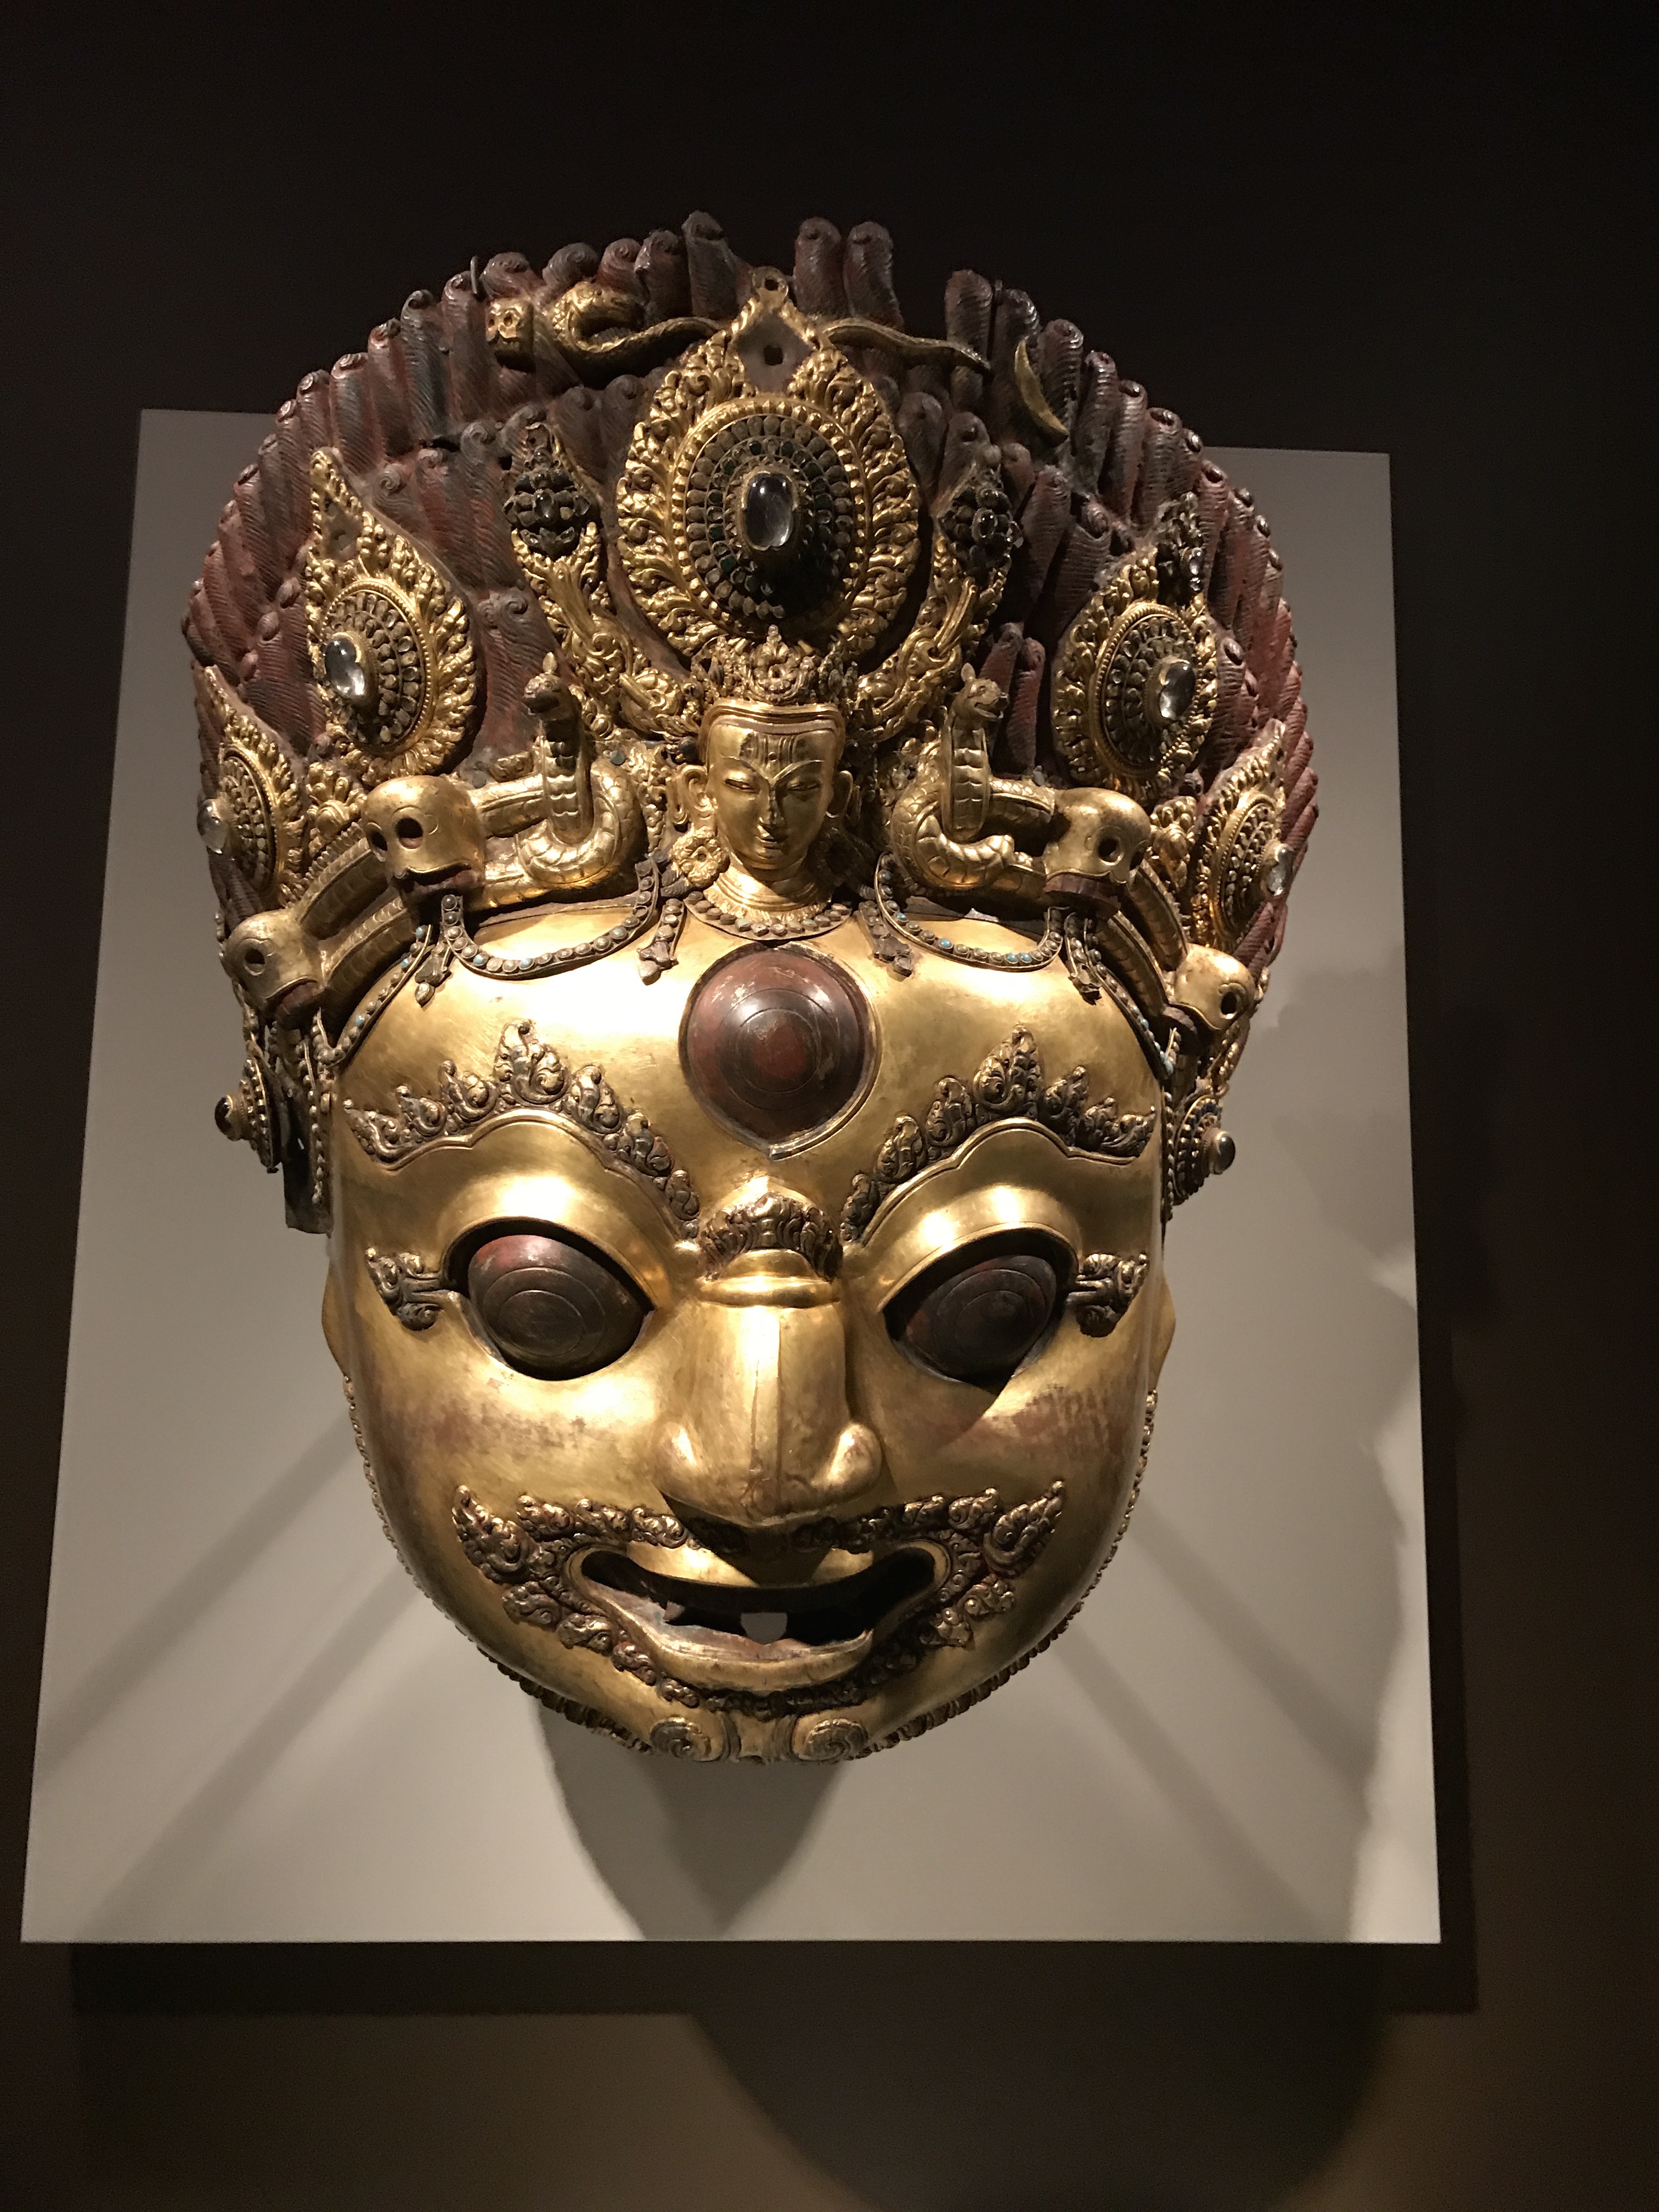 Suddenly Mad- Hatha Dya As Bairava (the terrifying one) Giant mask at Rubin